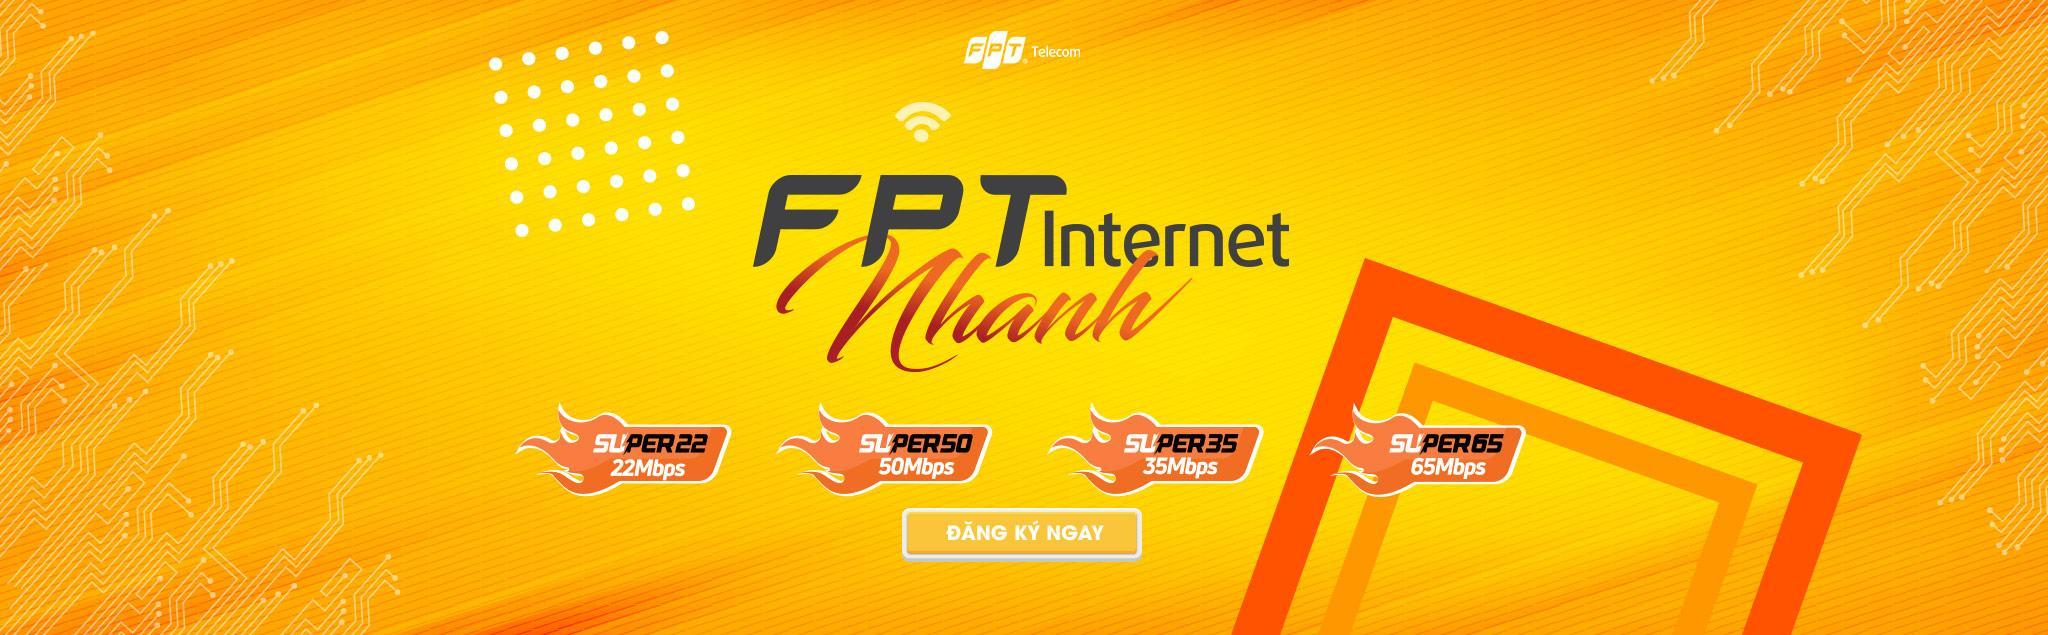 internet fpt tốc độ cao